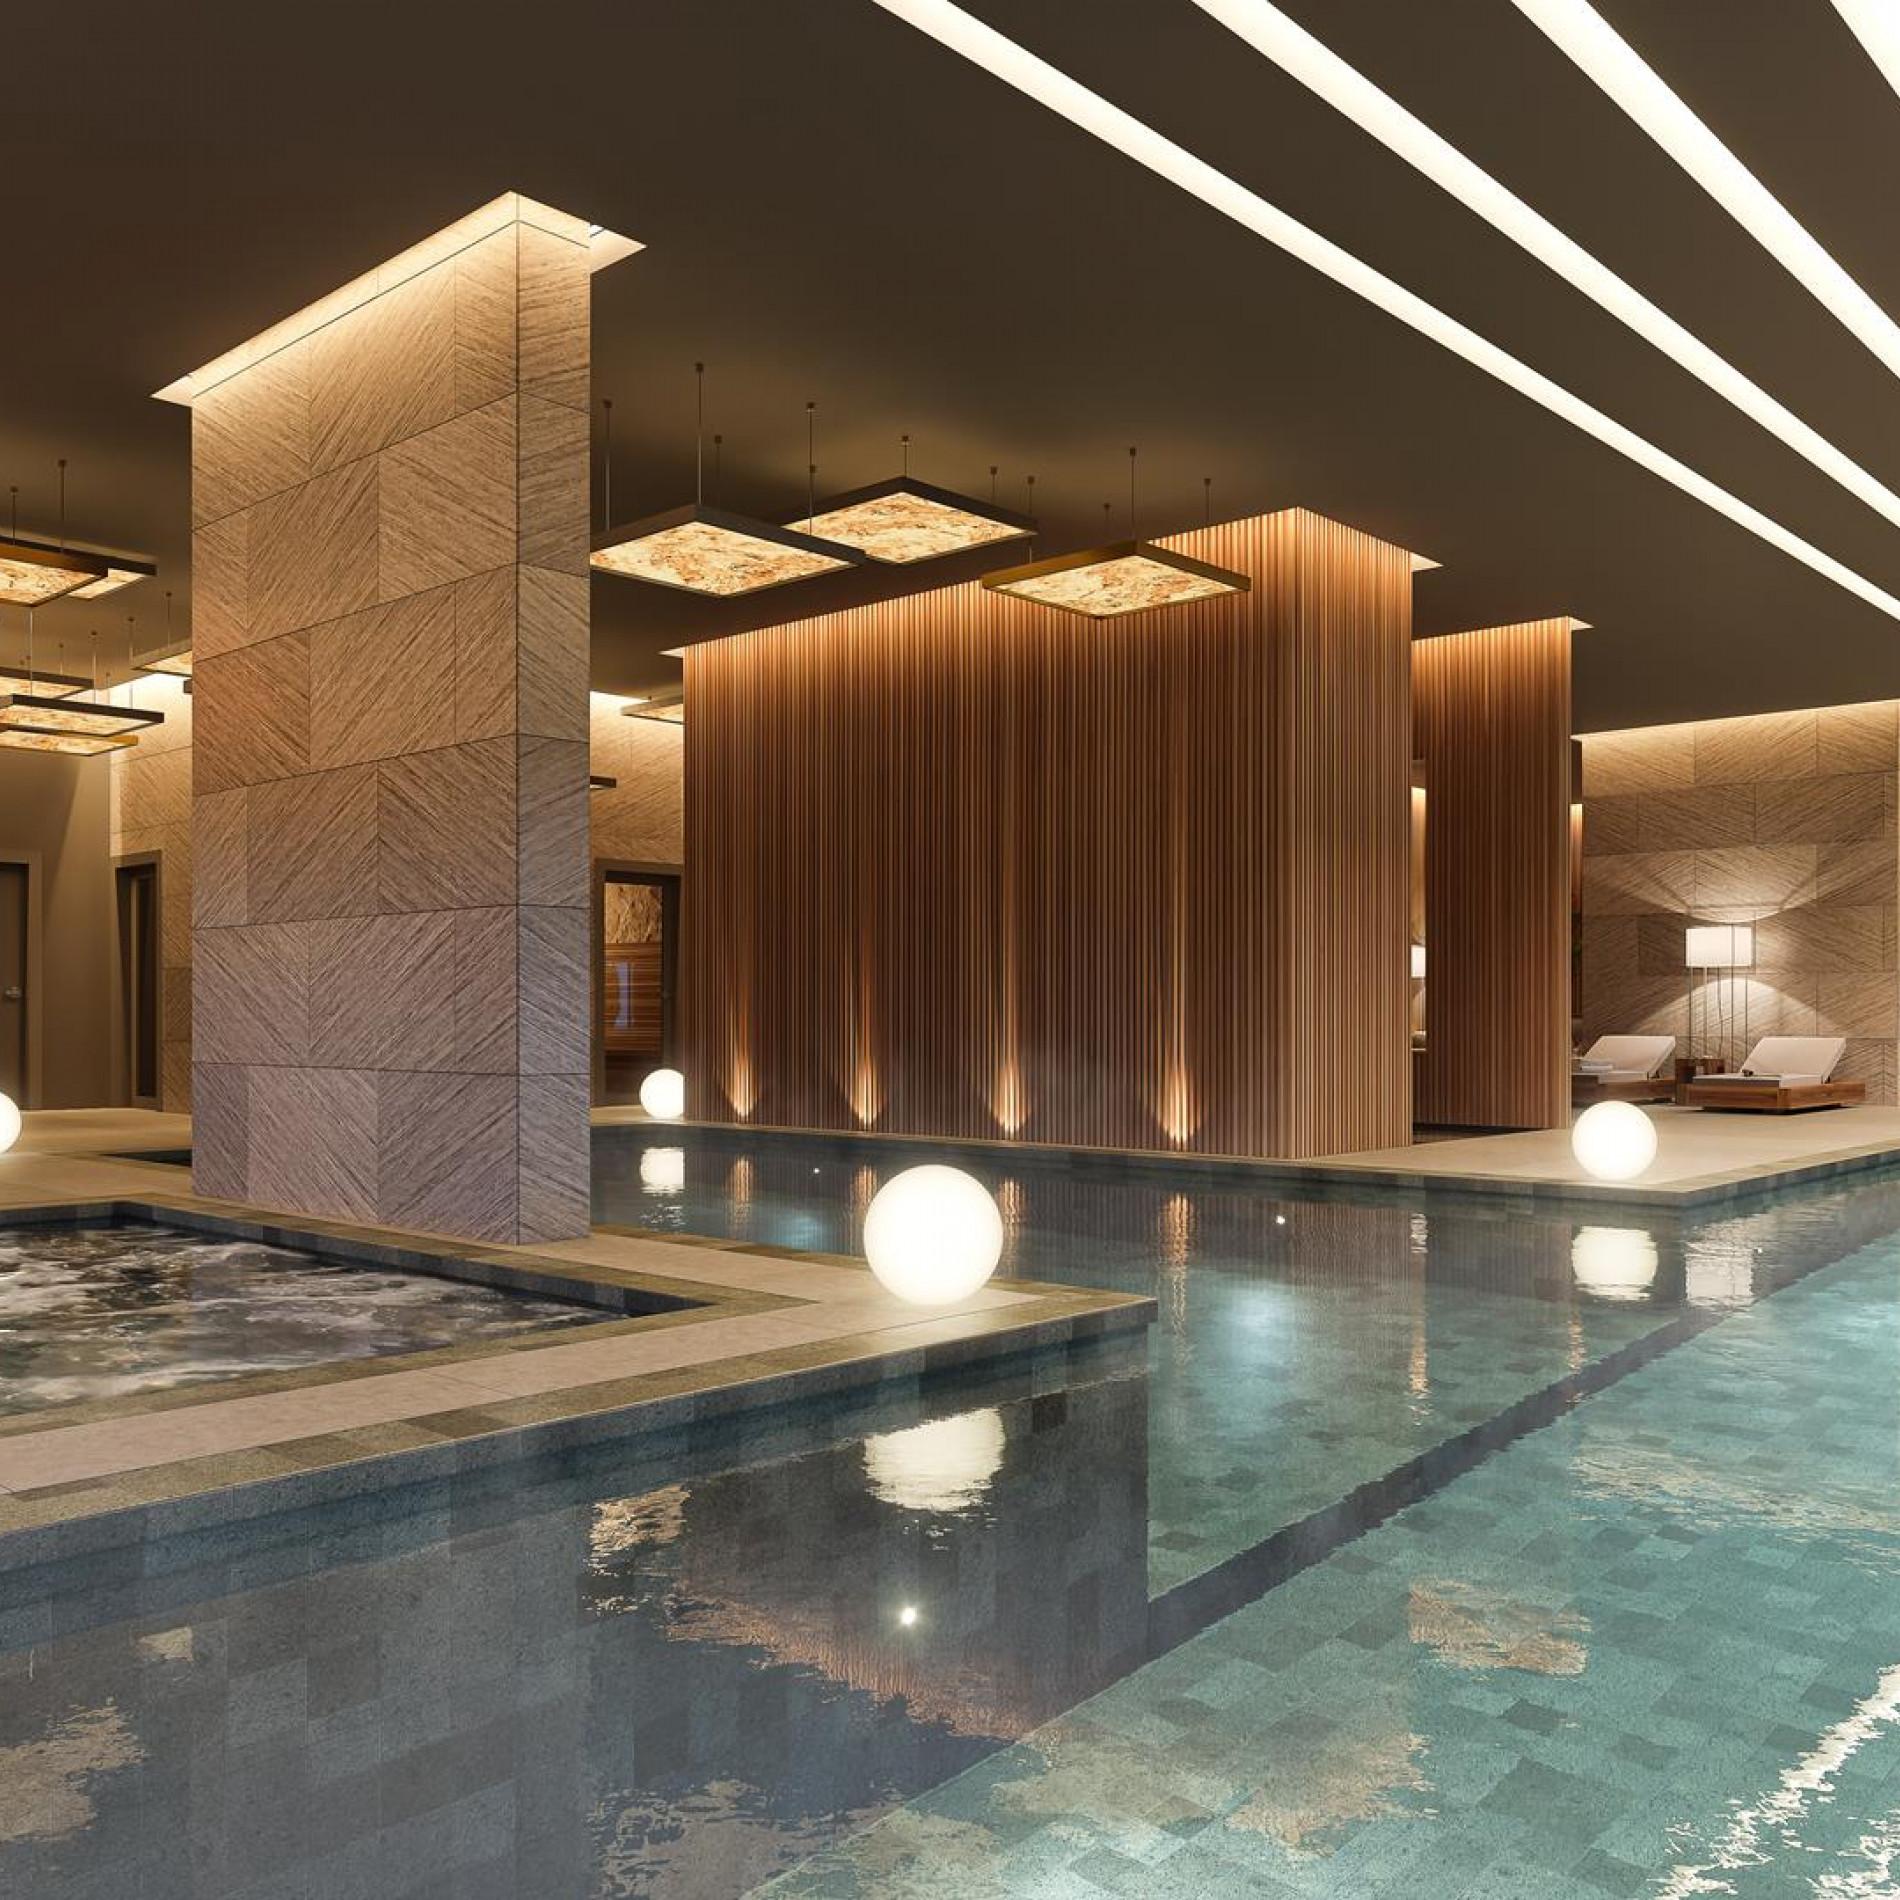 wellness-piscina-aquecida-solaia-embraed-maringa.jpg